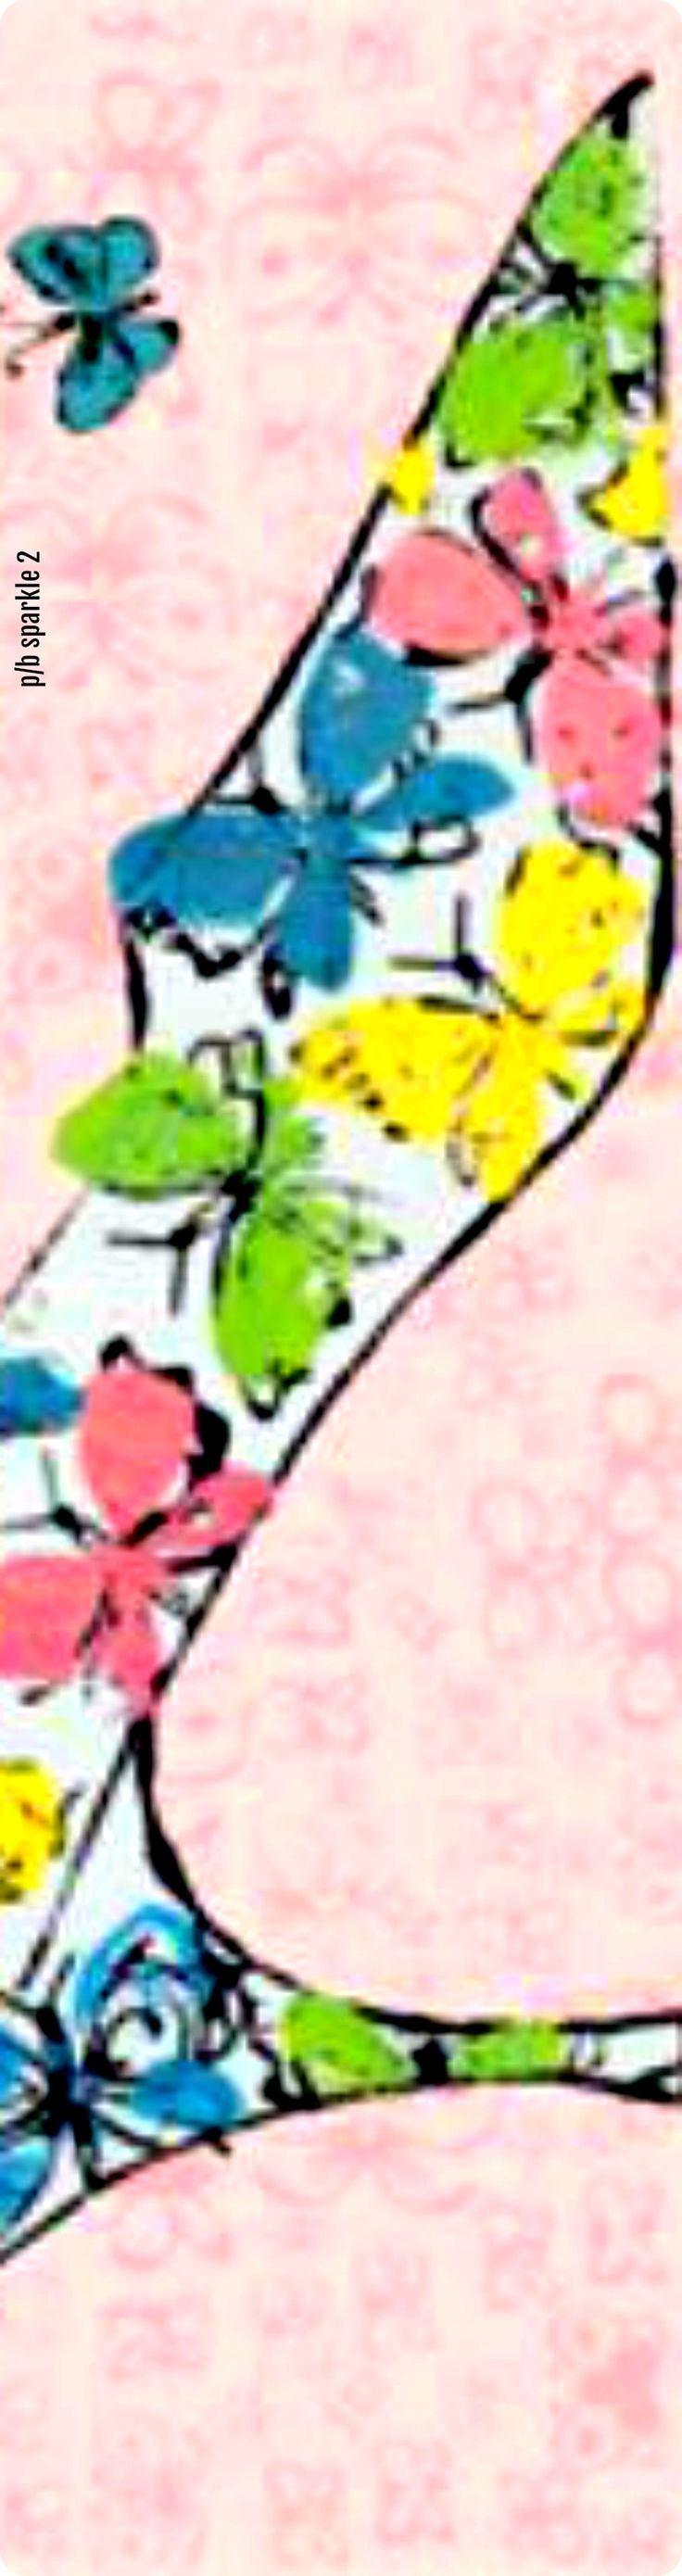 Andy warhol 19281987 flower shoe art illustration